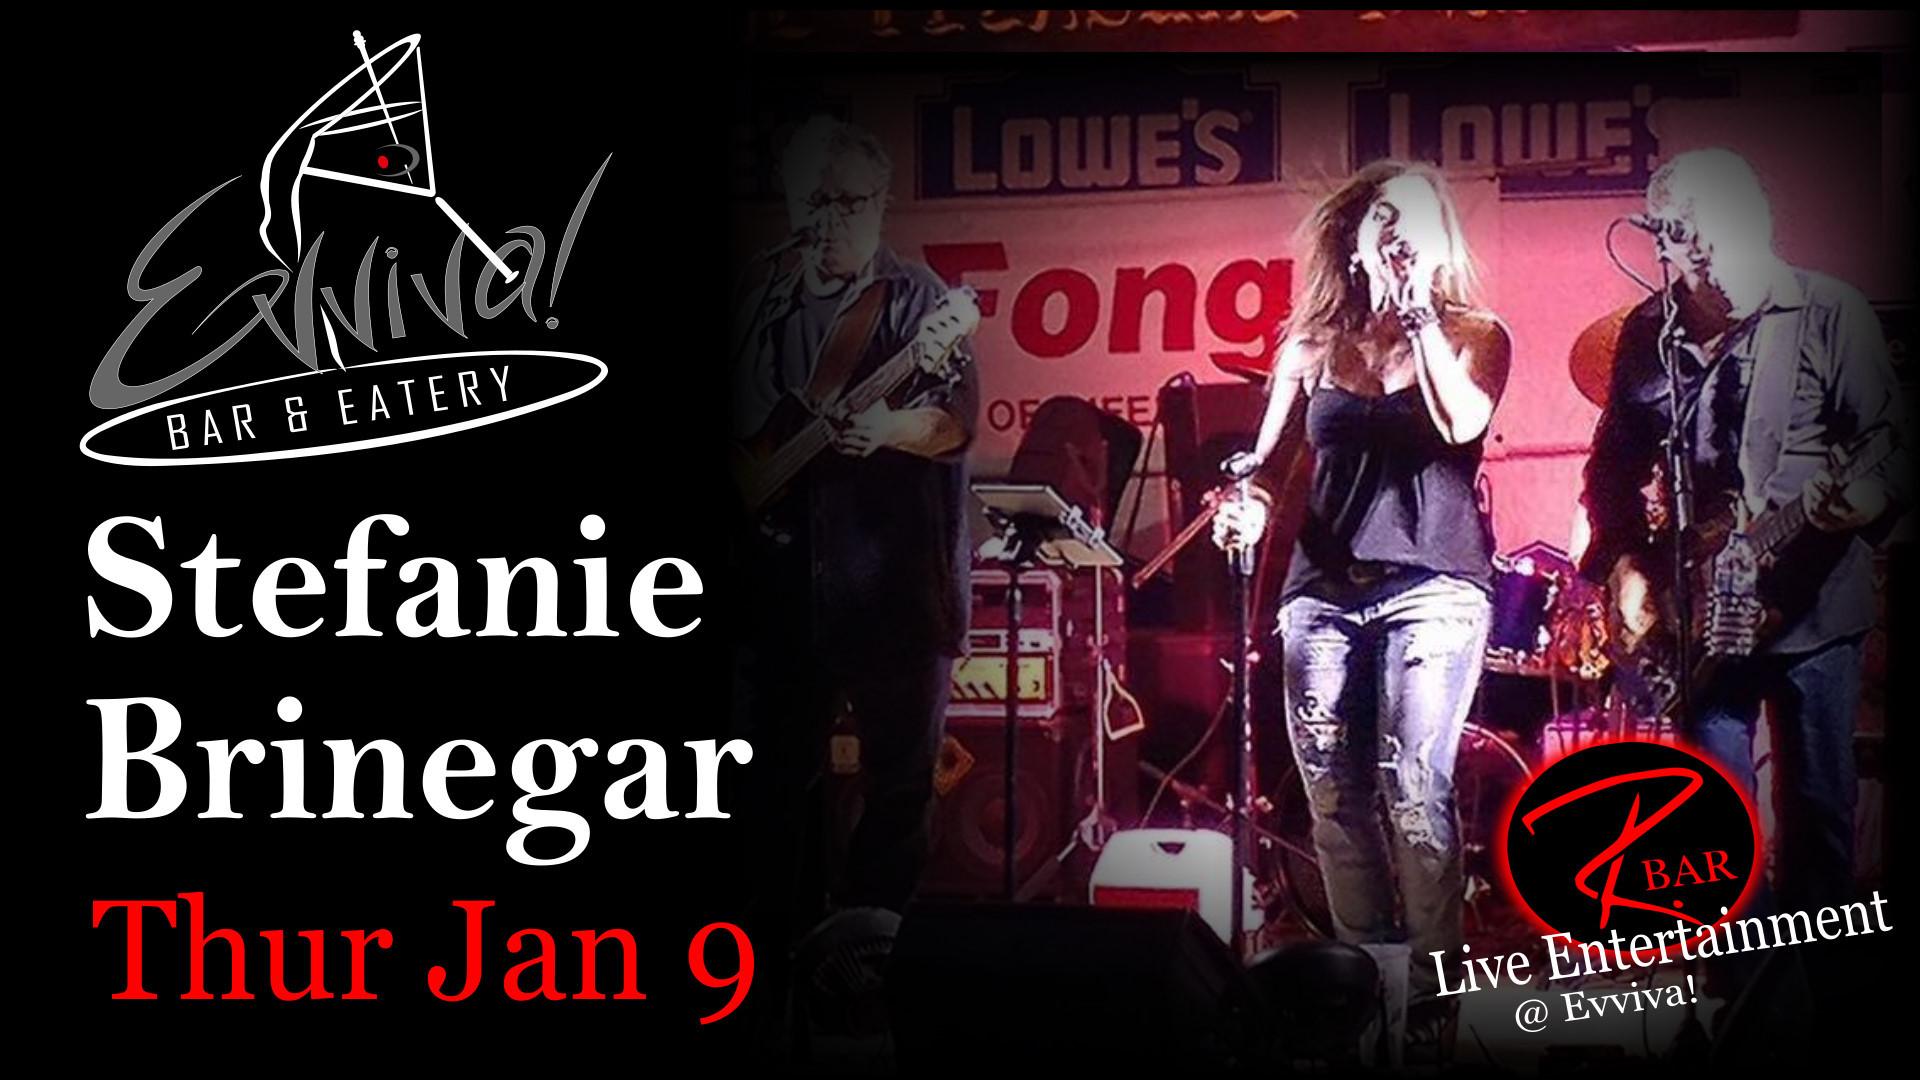 Stefanie Brinegar - Live Entertainment @ Evviva! Bar & Eatery